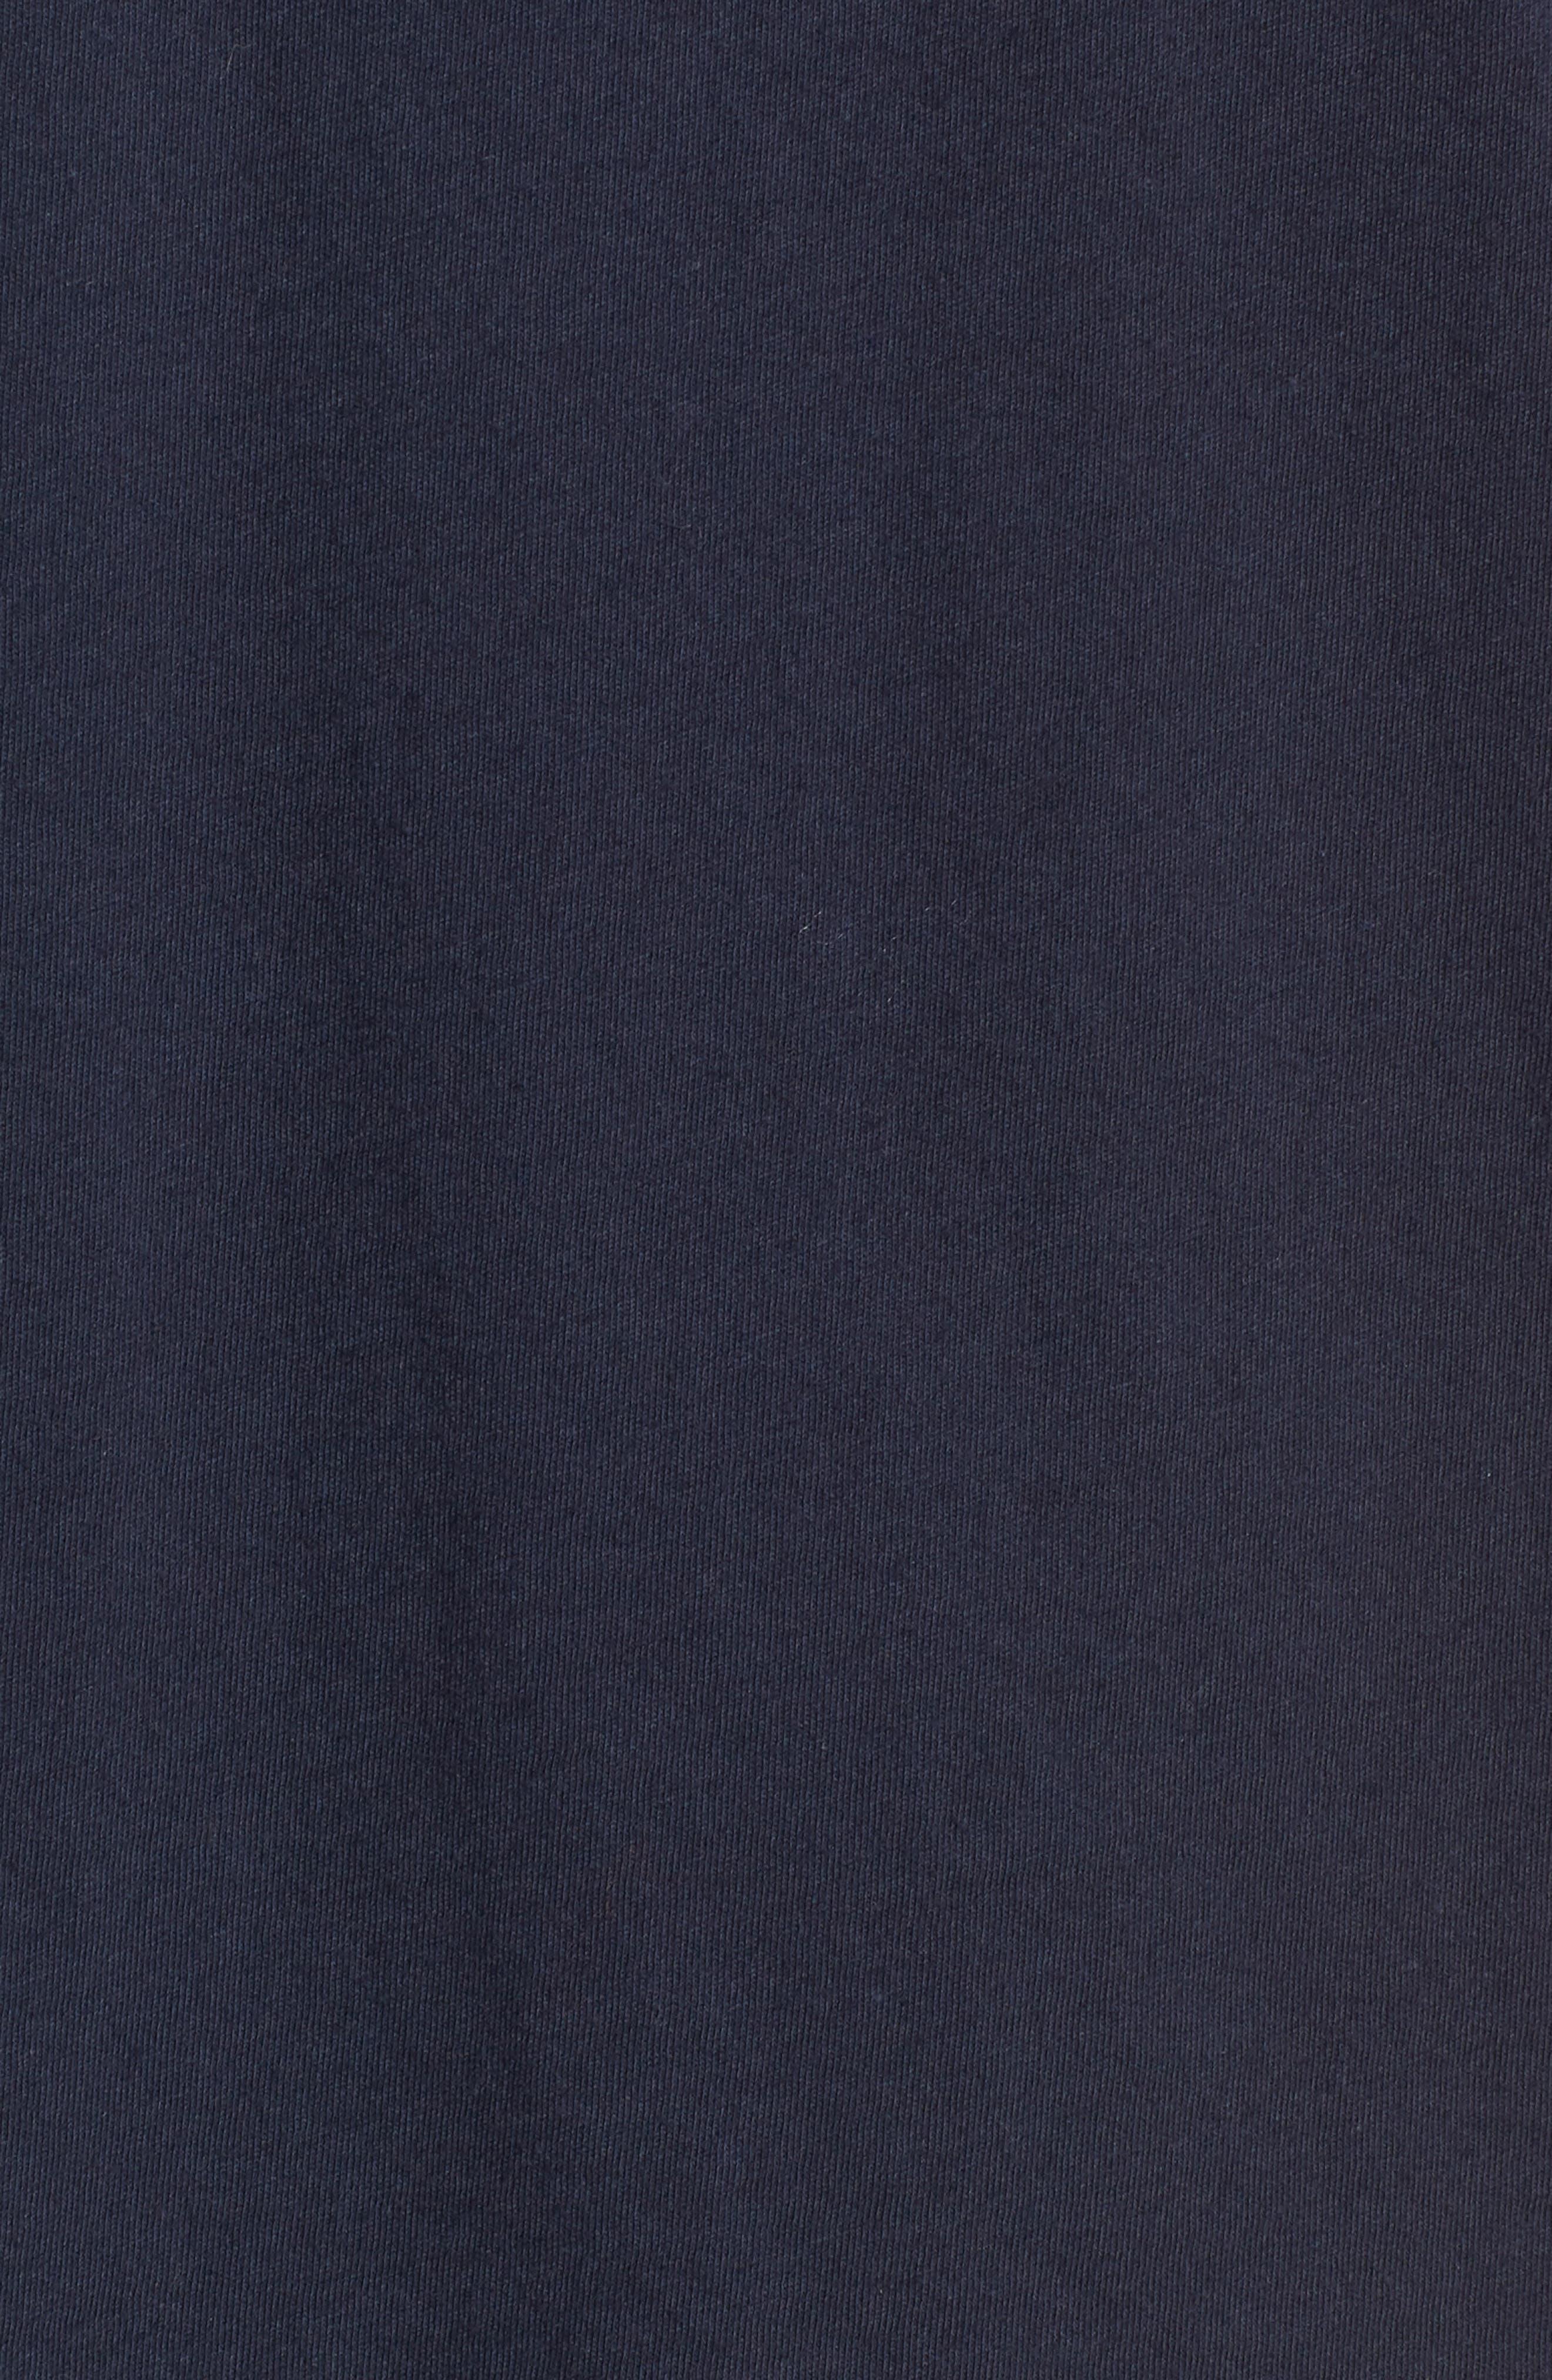 Great Outdoors Pocket T-Shirt,                             Alternate thumbnail 5, color,                             400